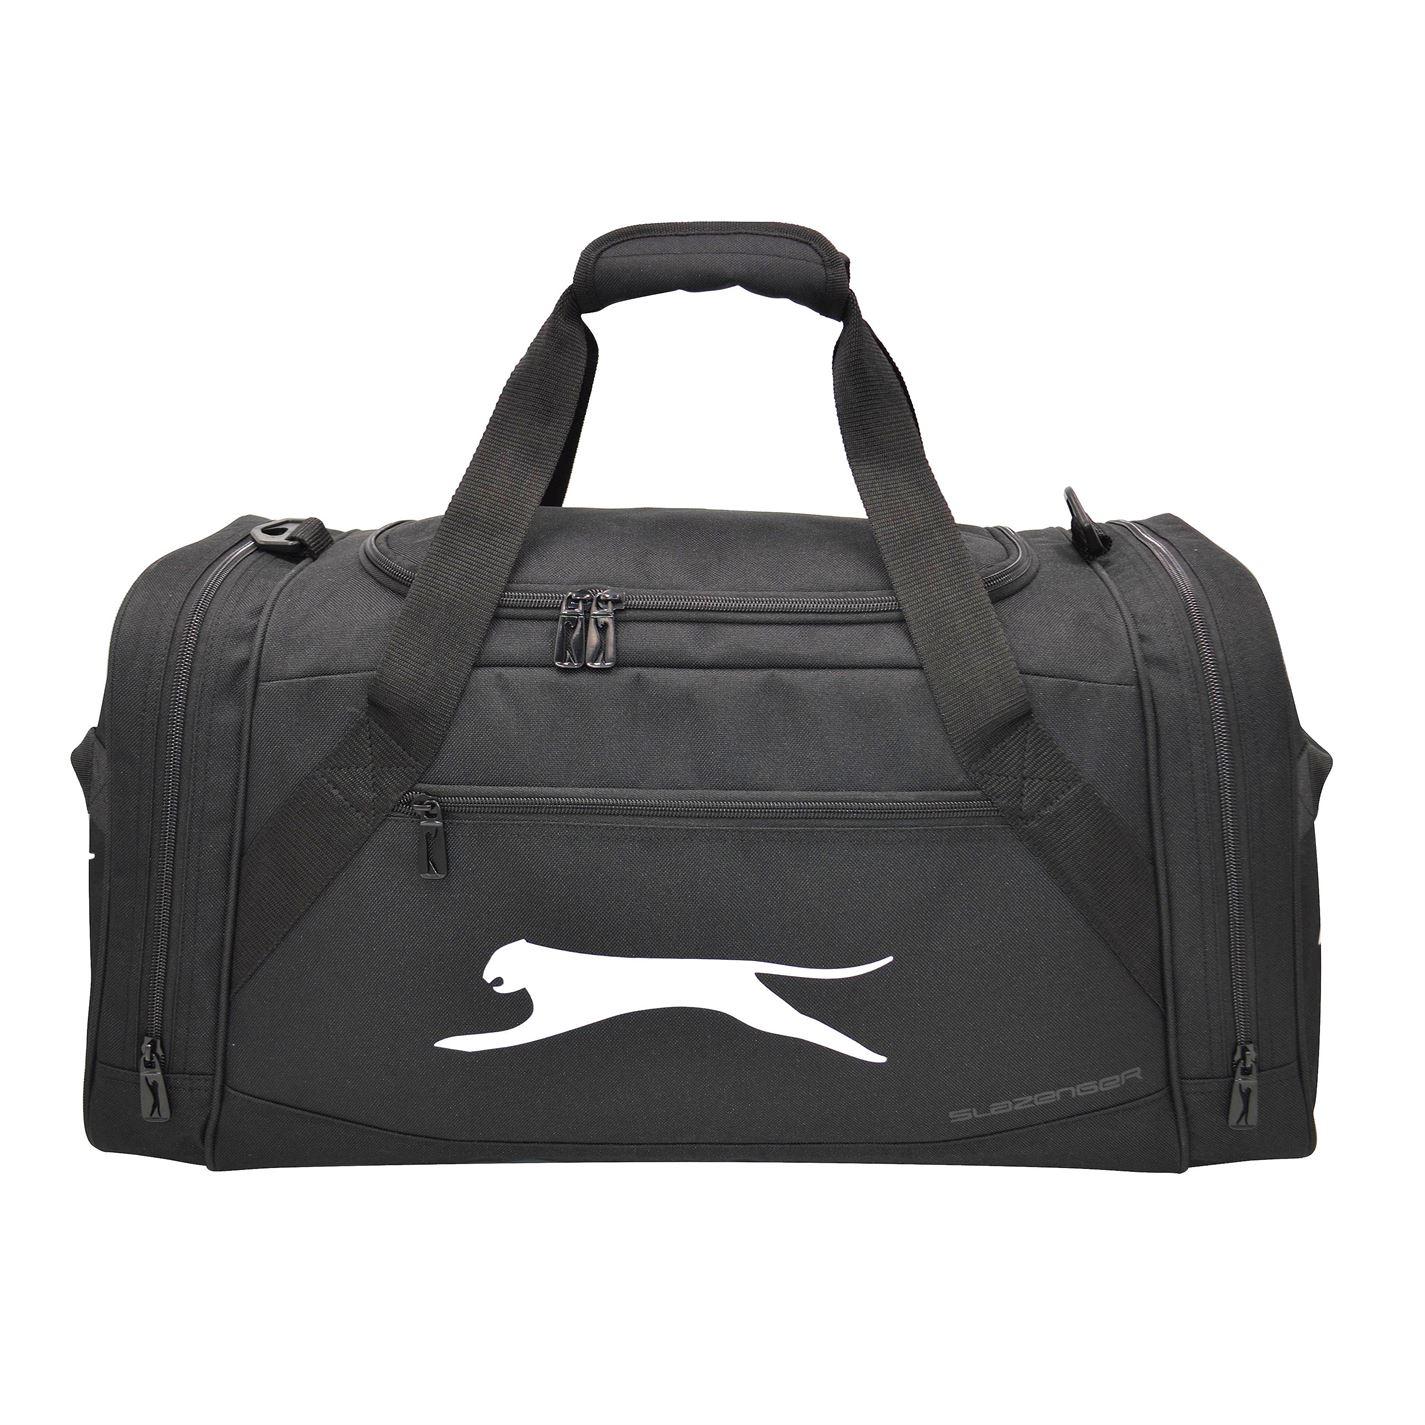 Slazenger Medium Holdall Zip Pockets Travel Storage Luggage ... 21fdc6ae1e